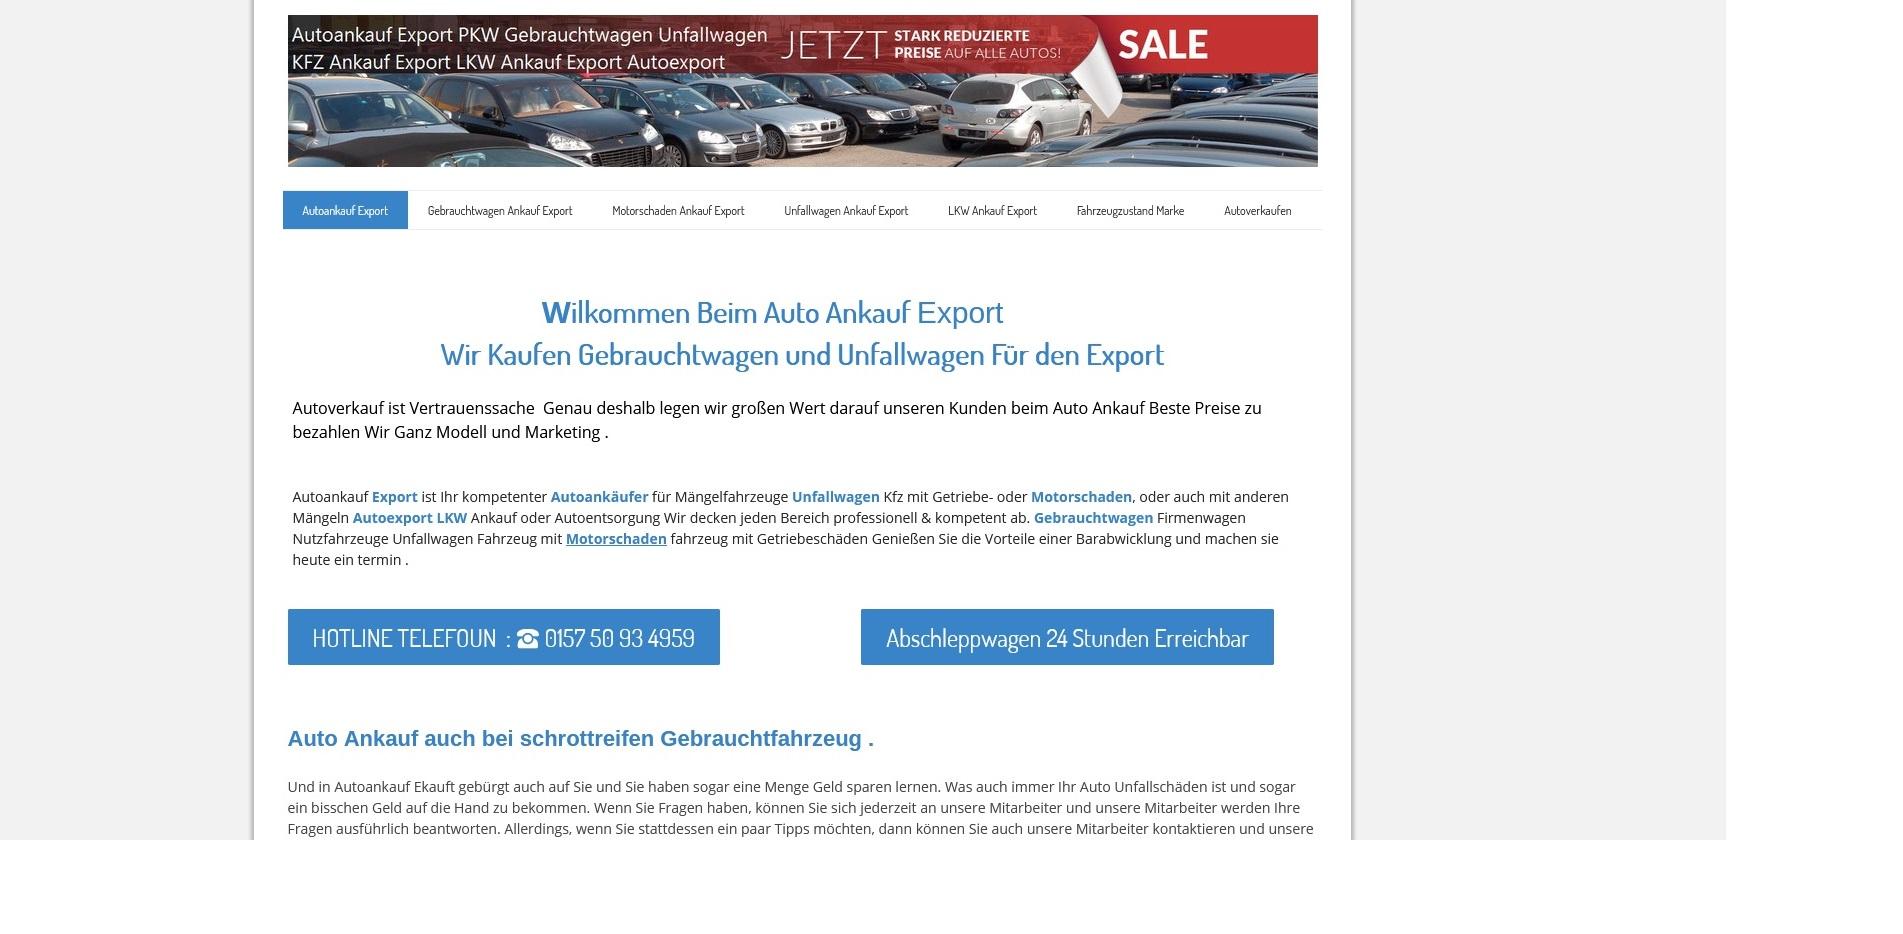 Autoankauf Herne - Kfz-Ankauf-export.de